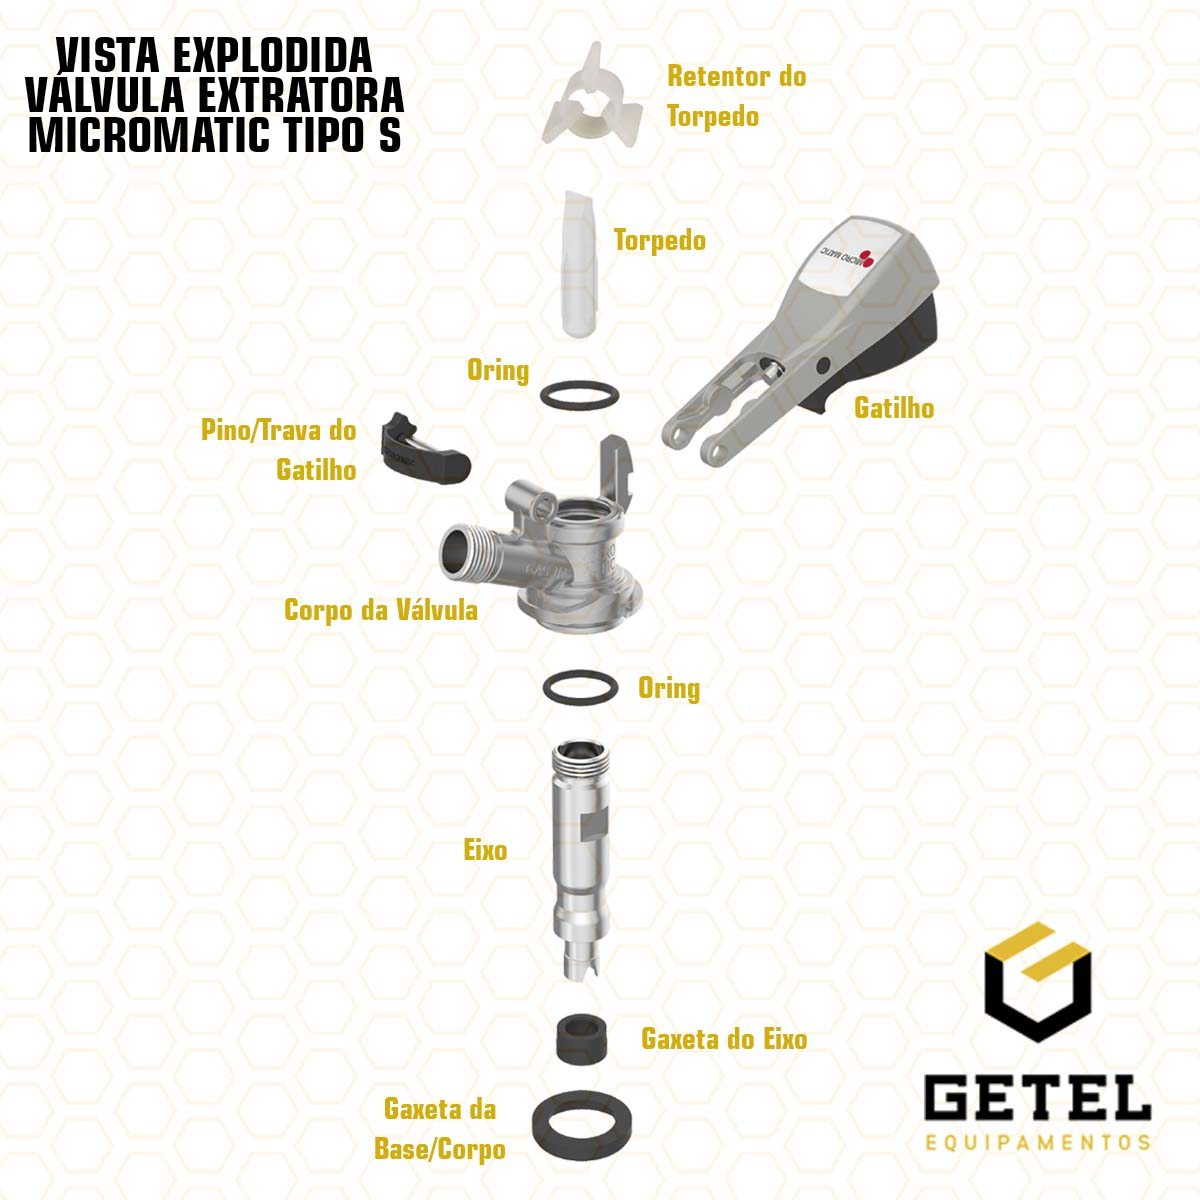 Pino/Trava do Gatilho - Válvula Extratora Micromatic